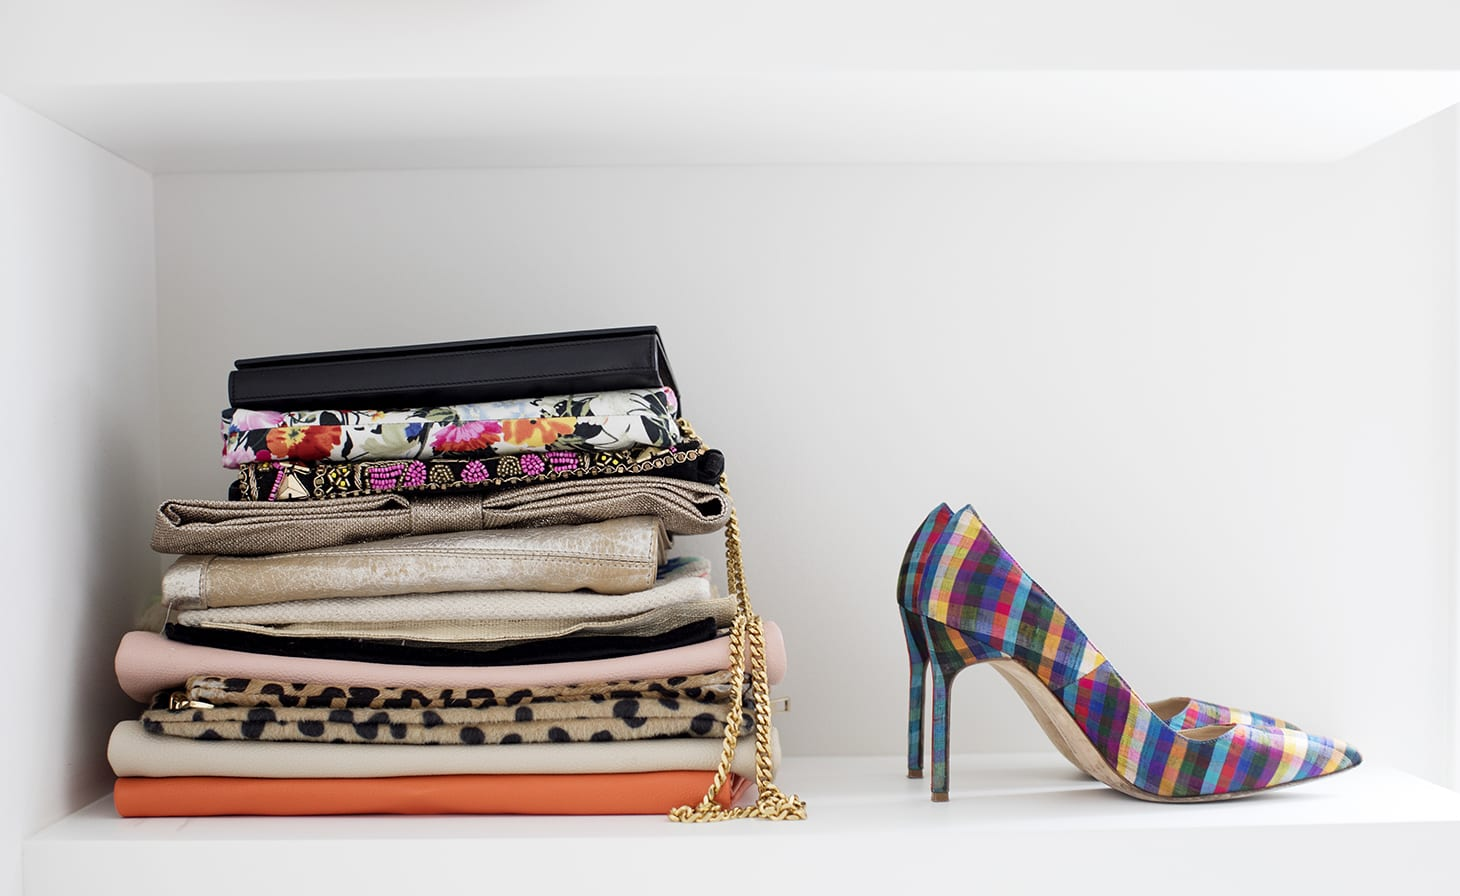 Jillian Harris 3 Fun (And Eco-Friendly!) Ways to Refresh Your Closet This Fall